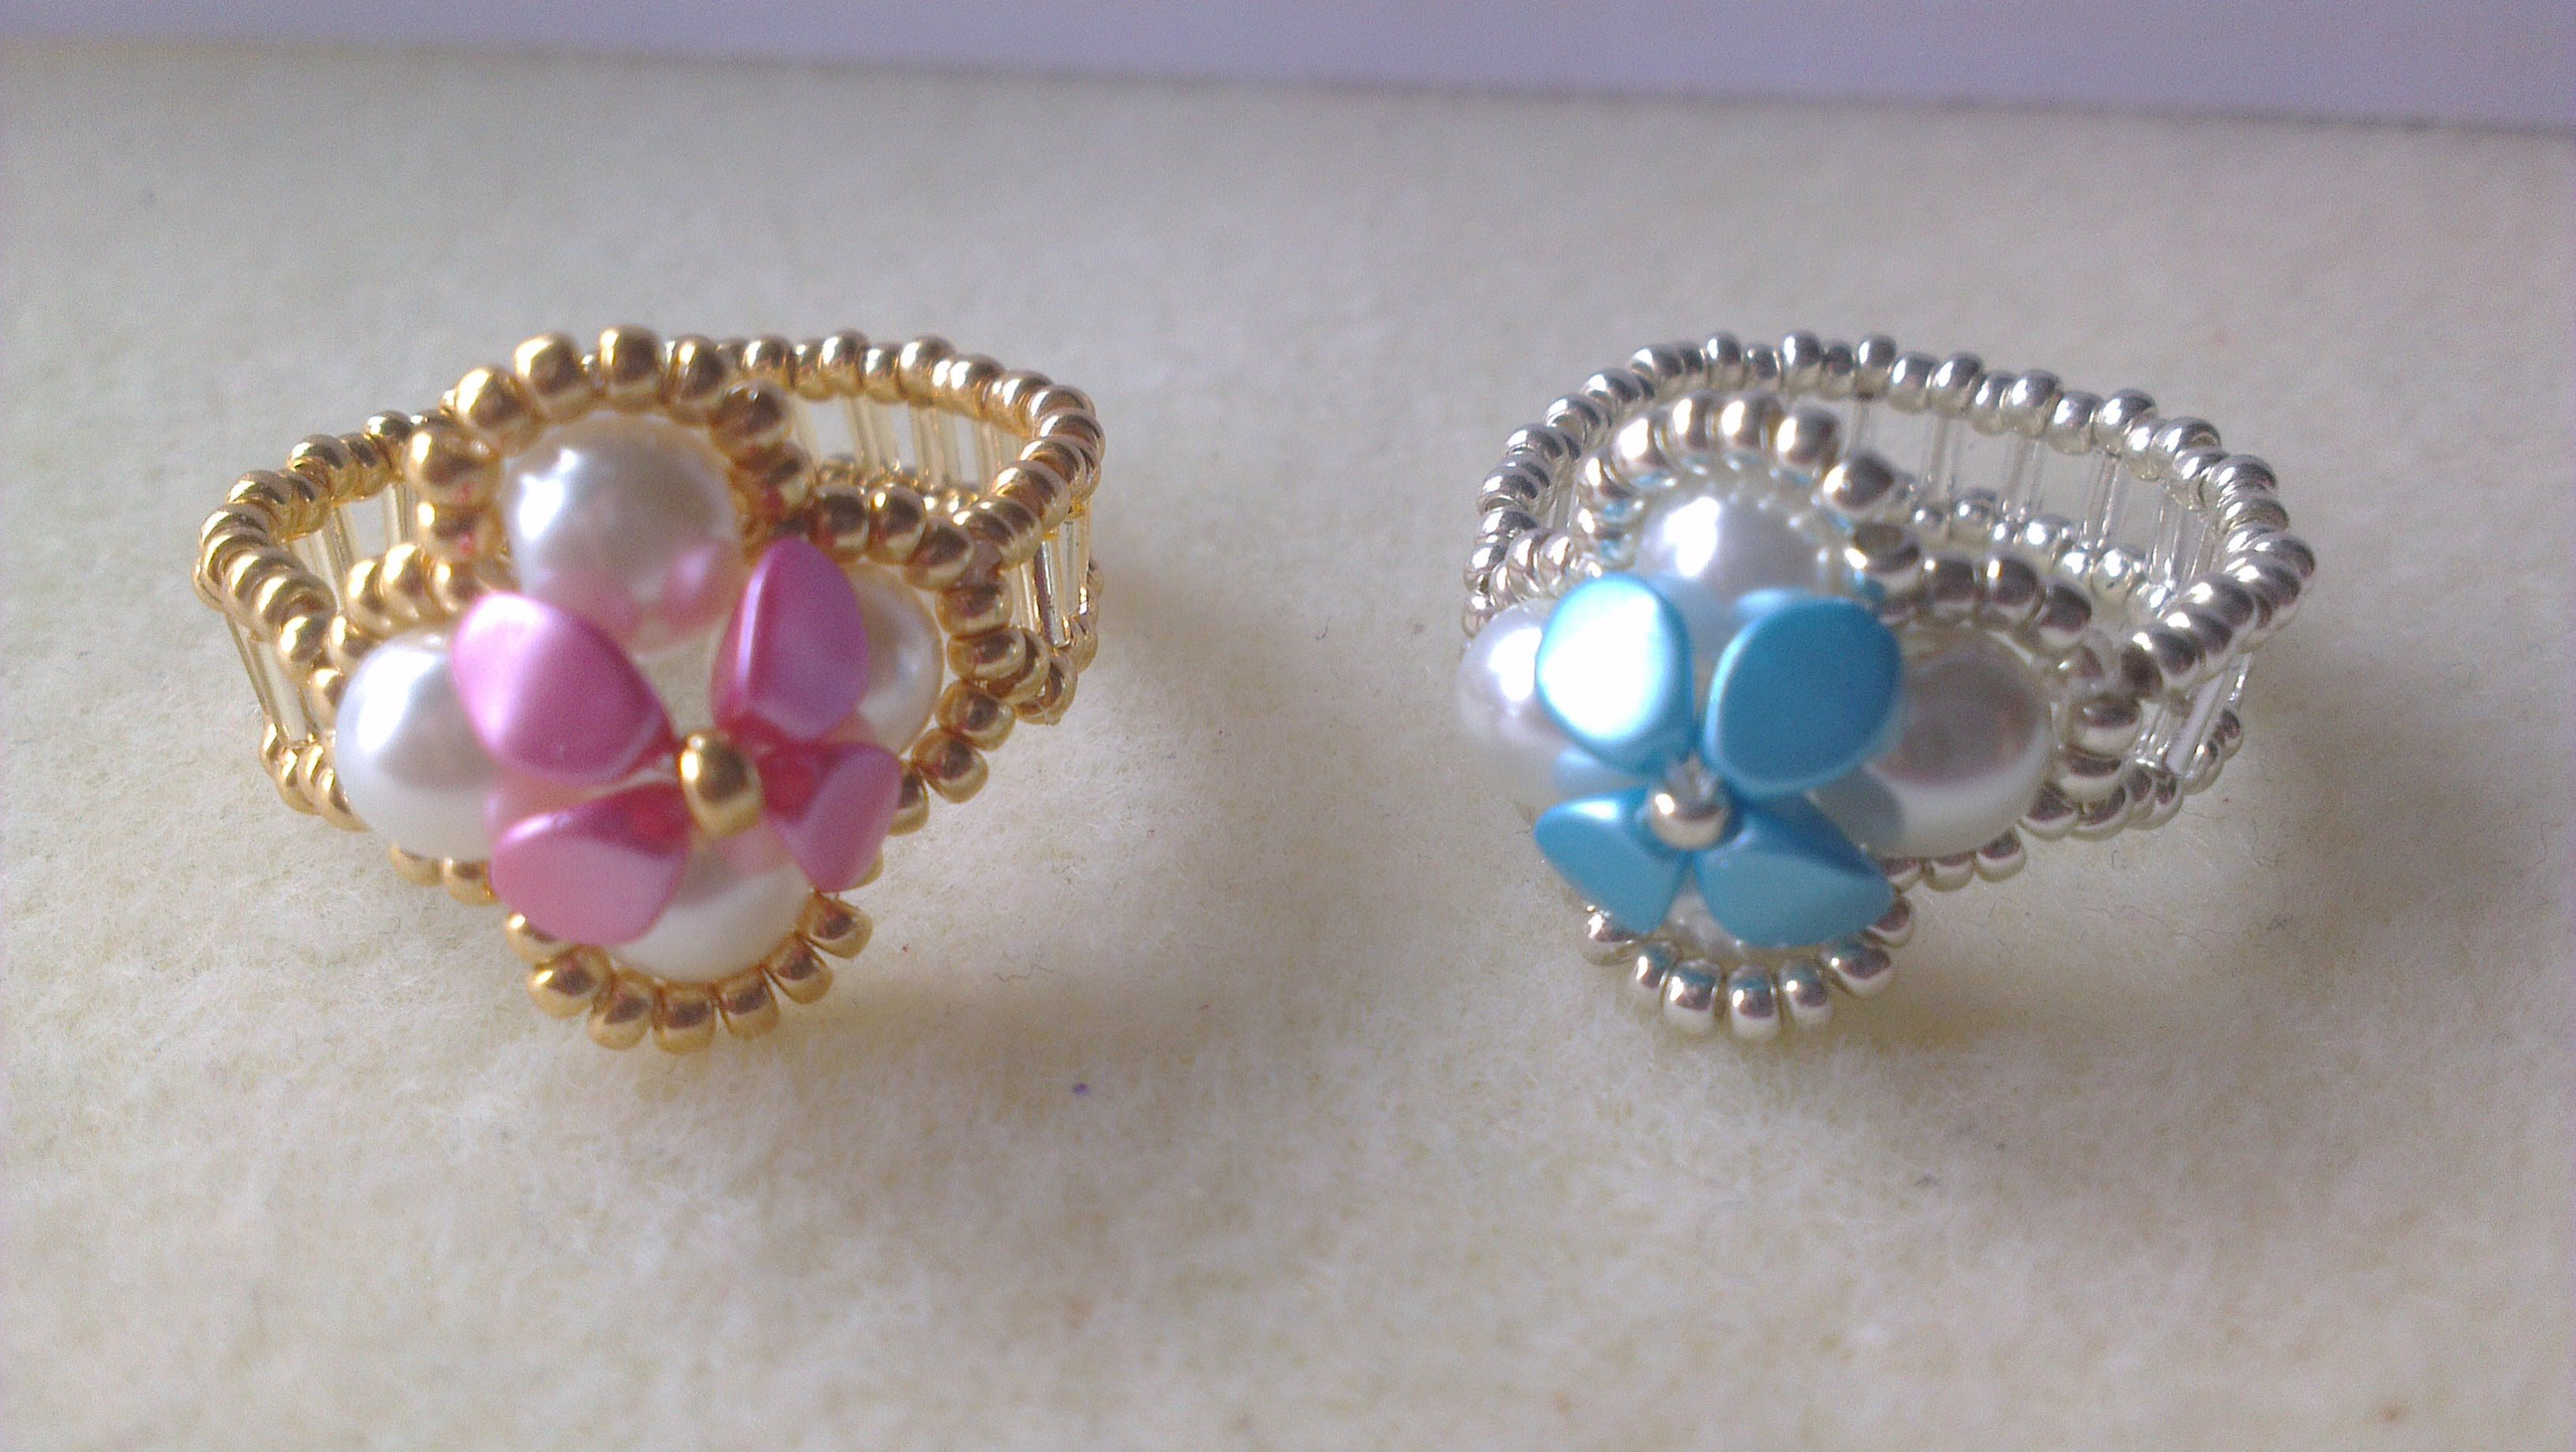 0503405ffb01 Anillos perlas y cuentas pinch- Pearls and pinch beads earrings ...